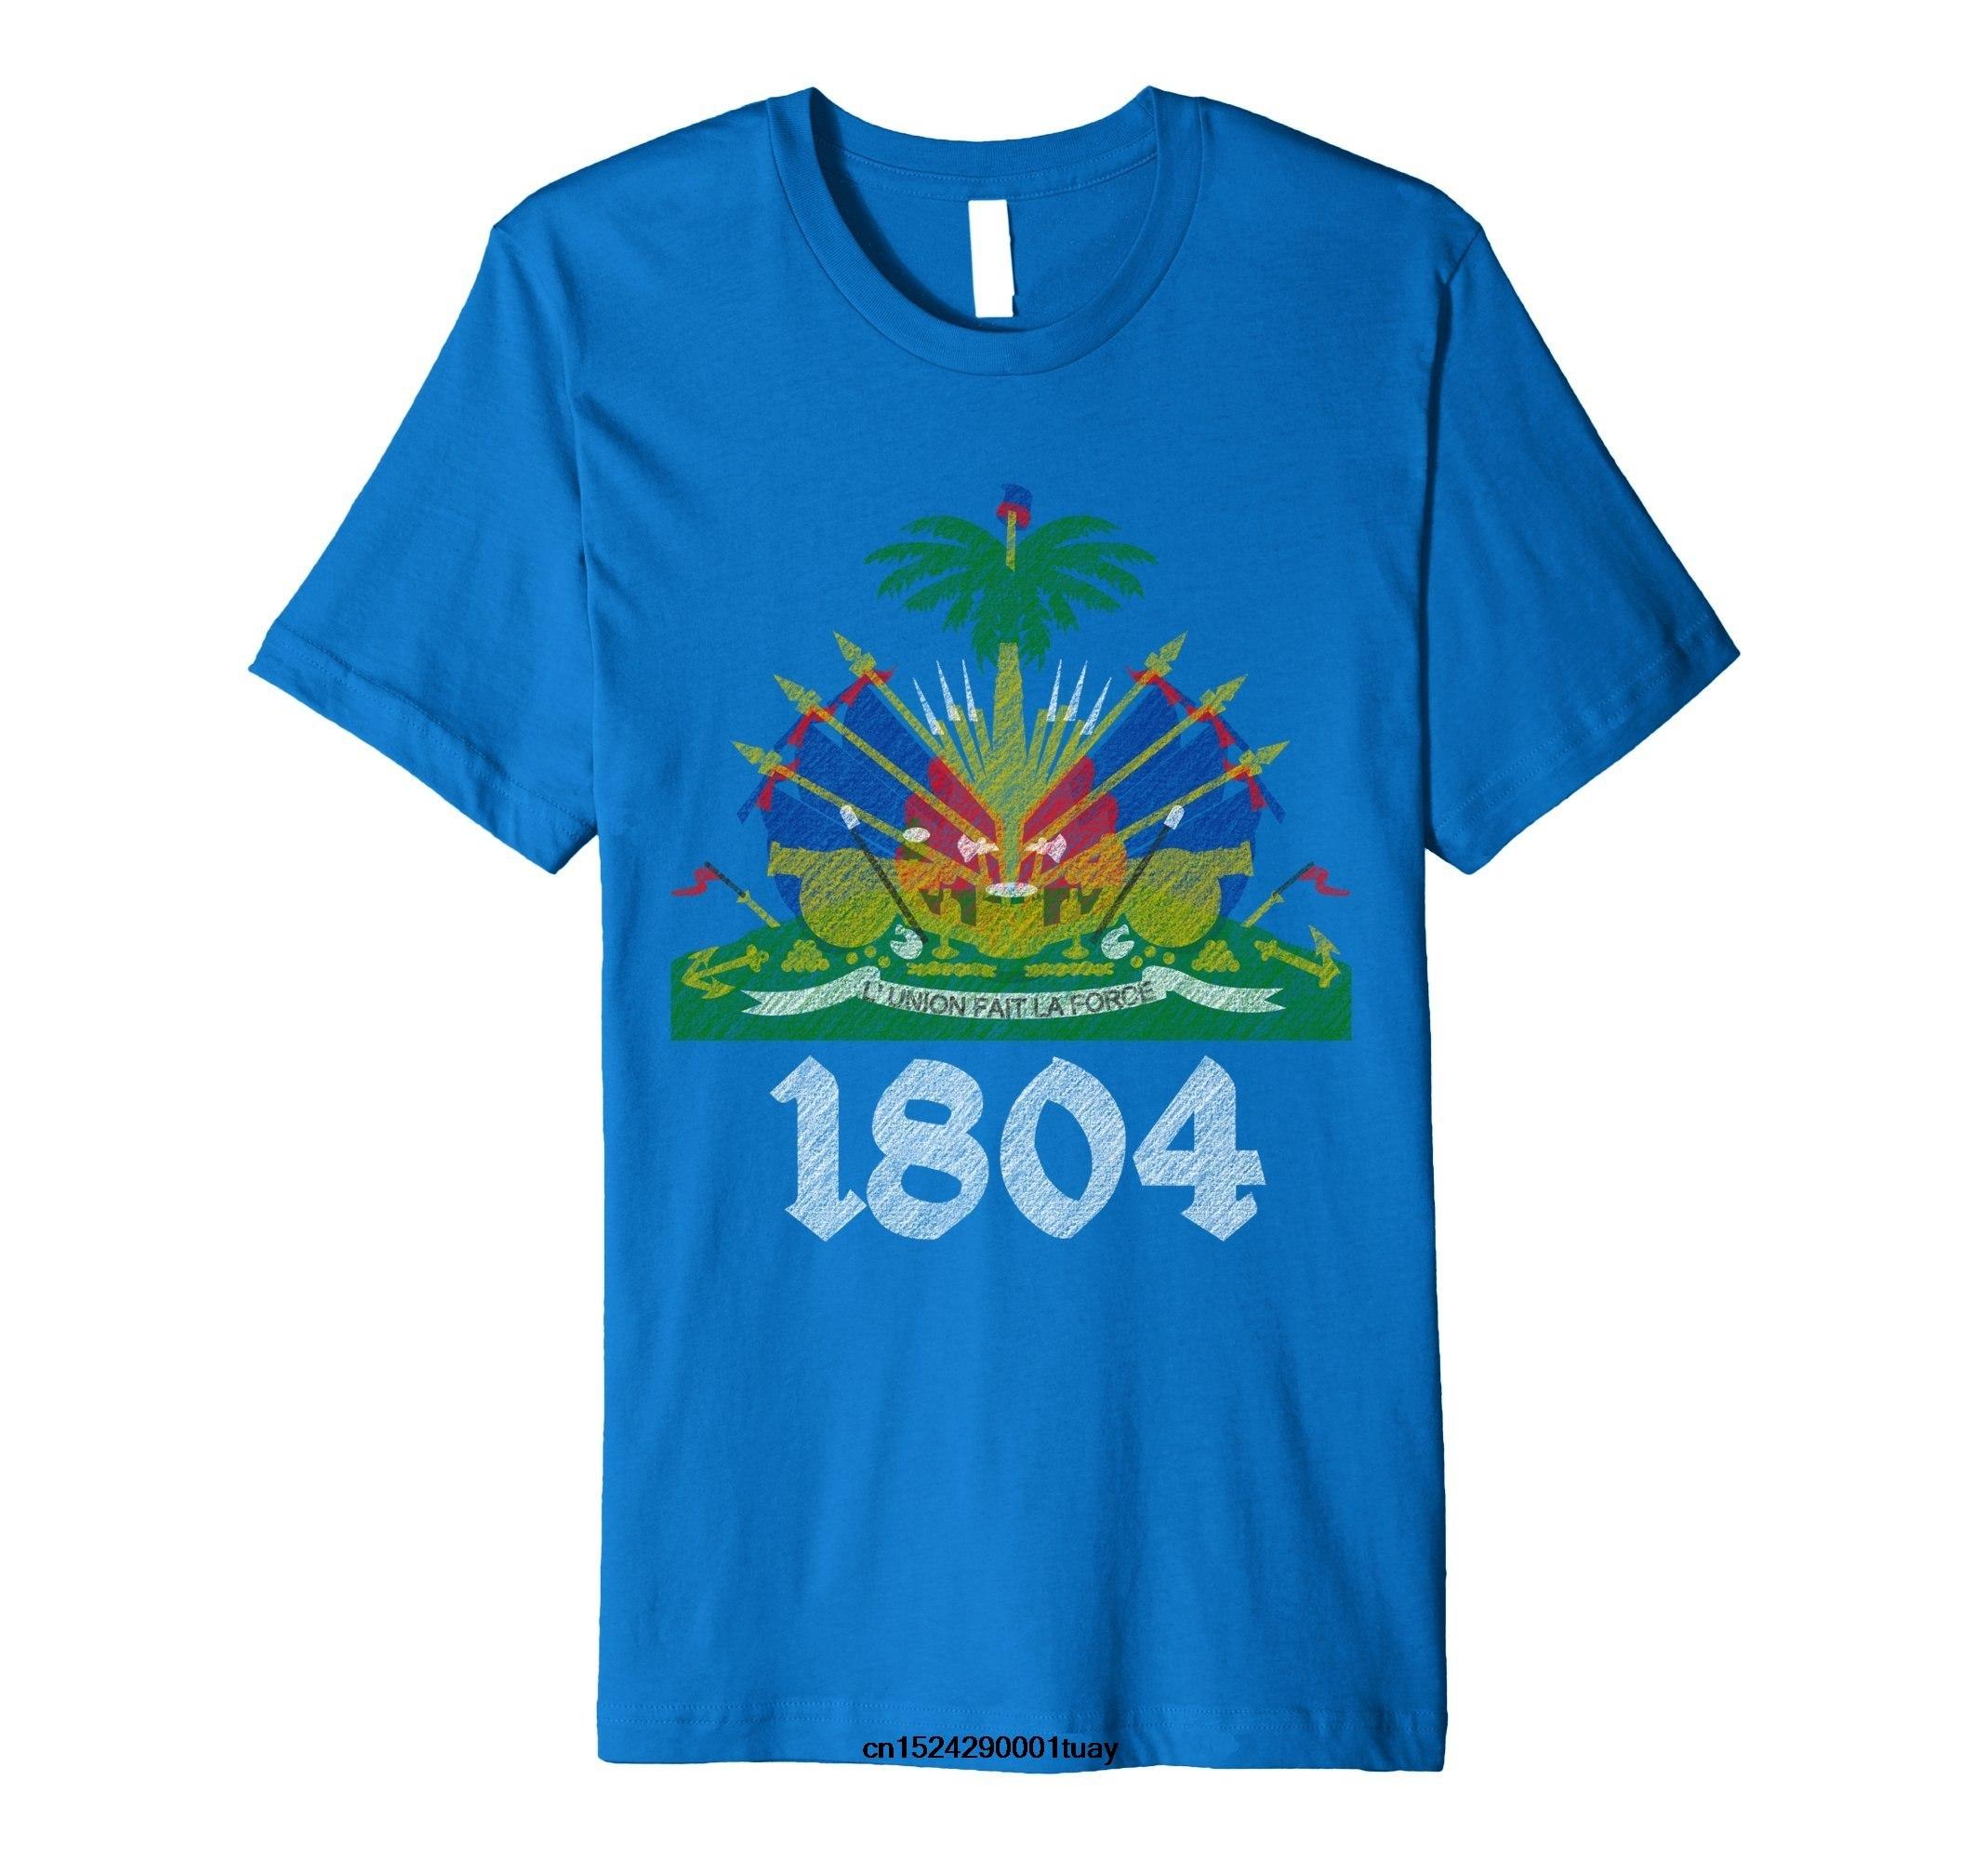 Cooperative Funny T Shirt Men Novelty Women Tshirt Haitian Zoe T-shirt Tops & Tees Haitian Pride For Haitian Flag Day